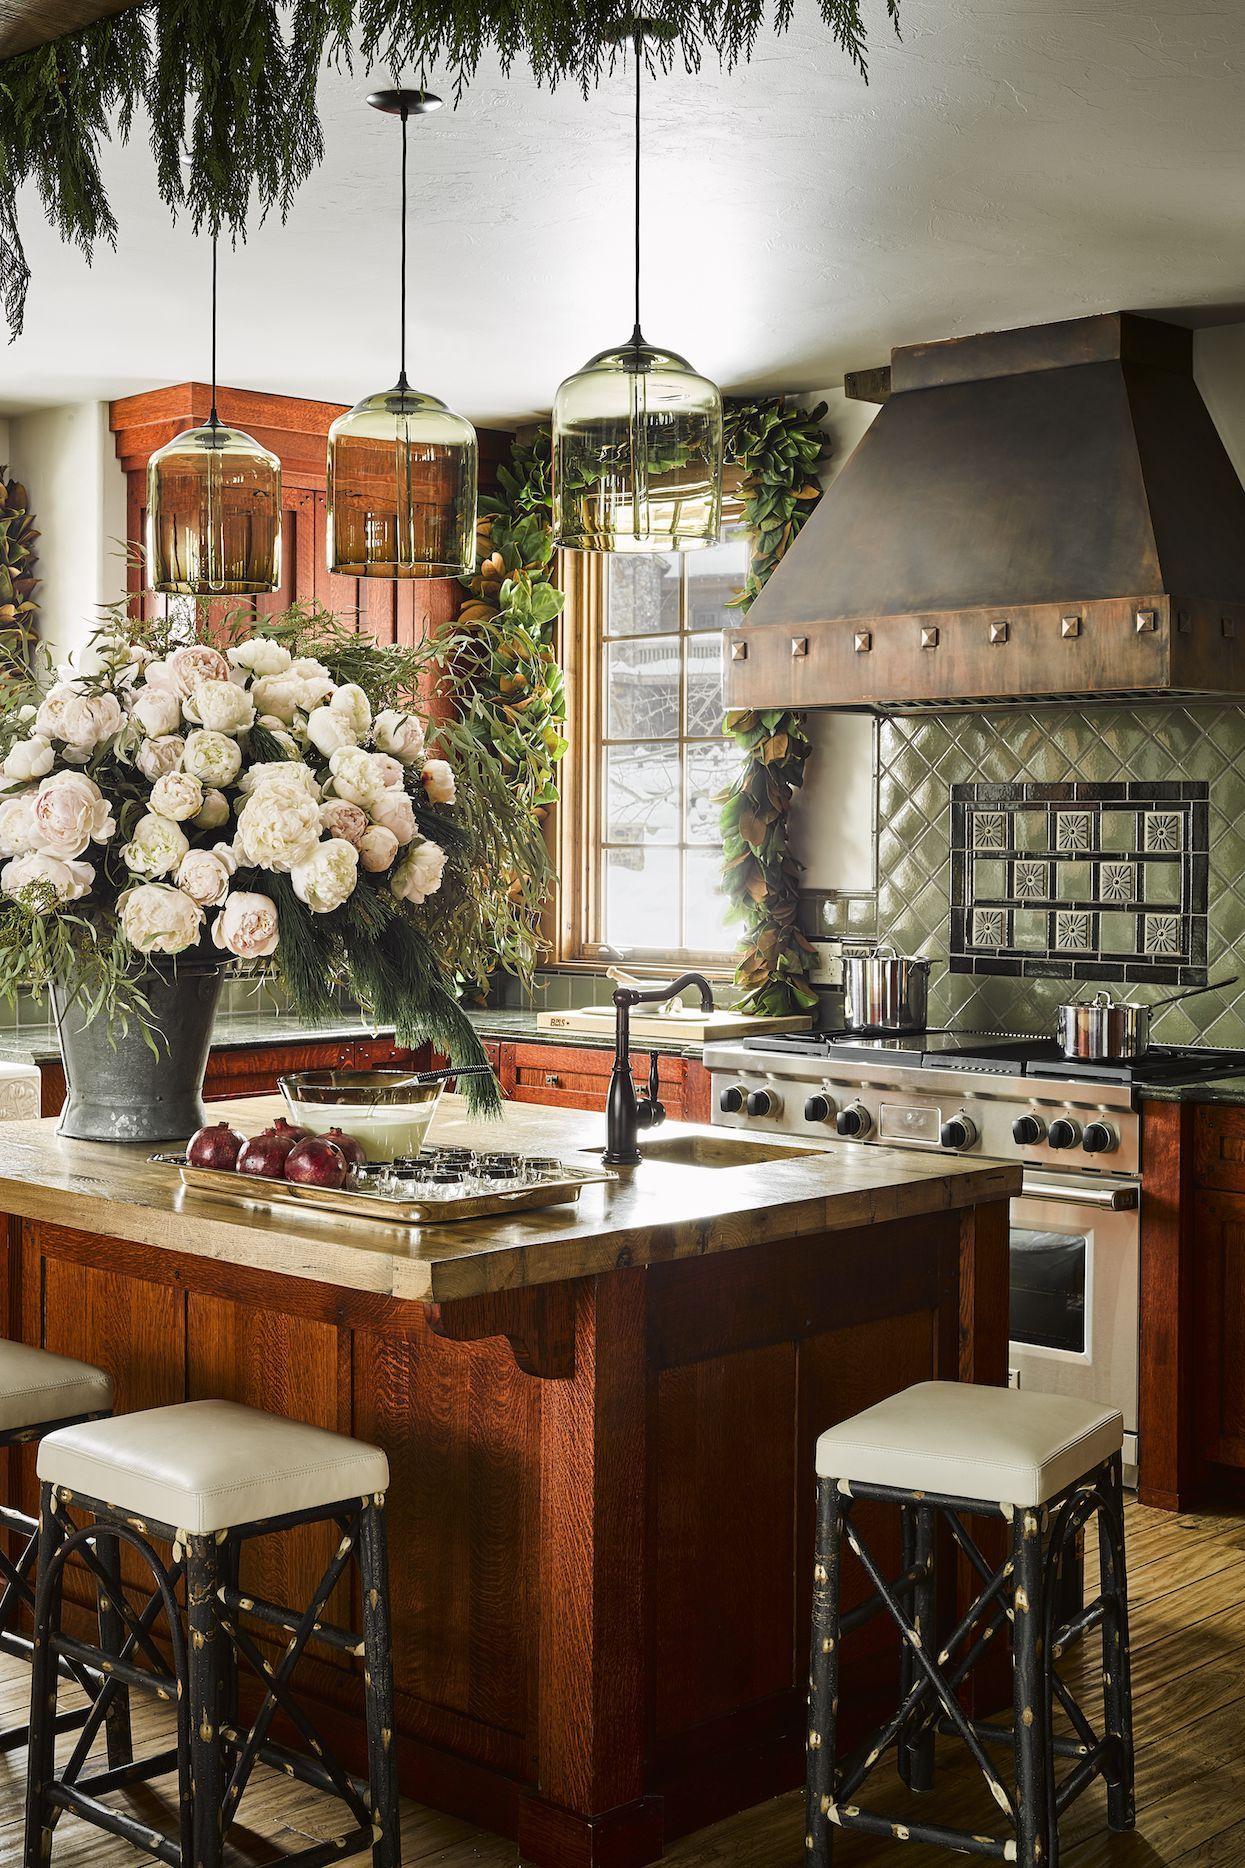 26 Kitchen Tile Backsplash Ideas to Show Off Your Style